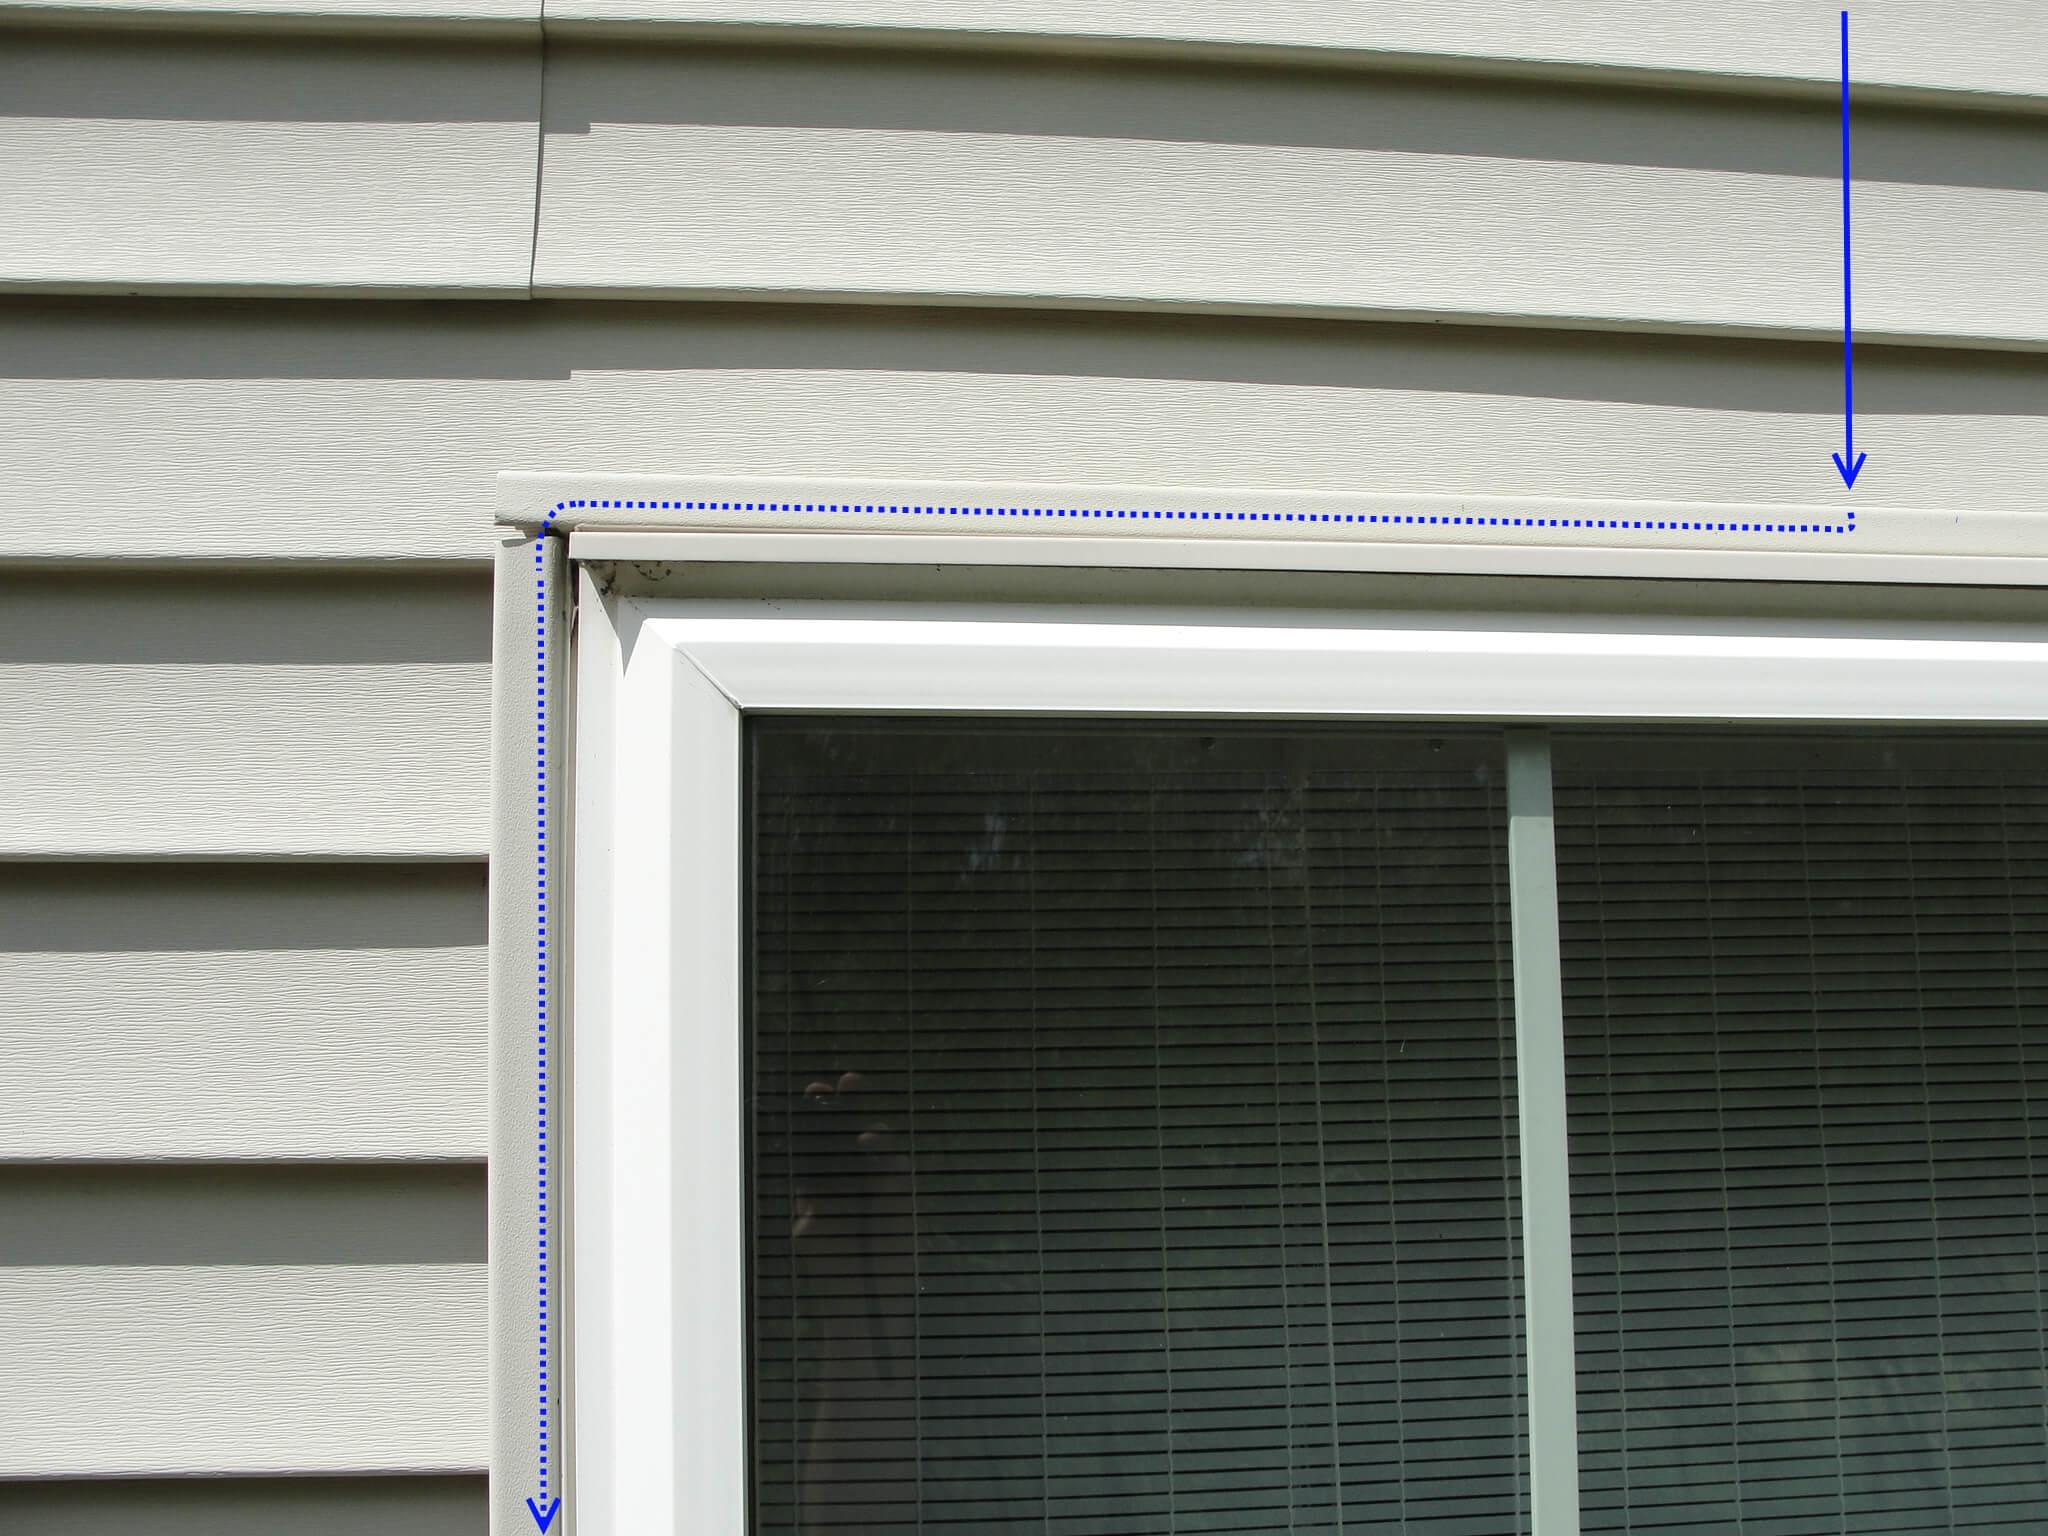 Window stains window leaks homesmsp for Window flashing